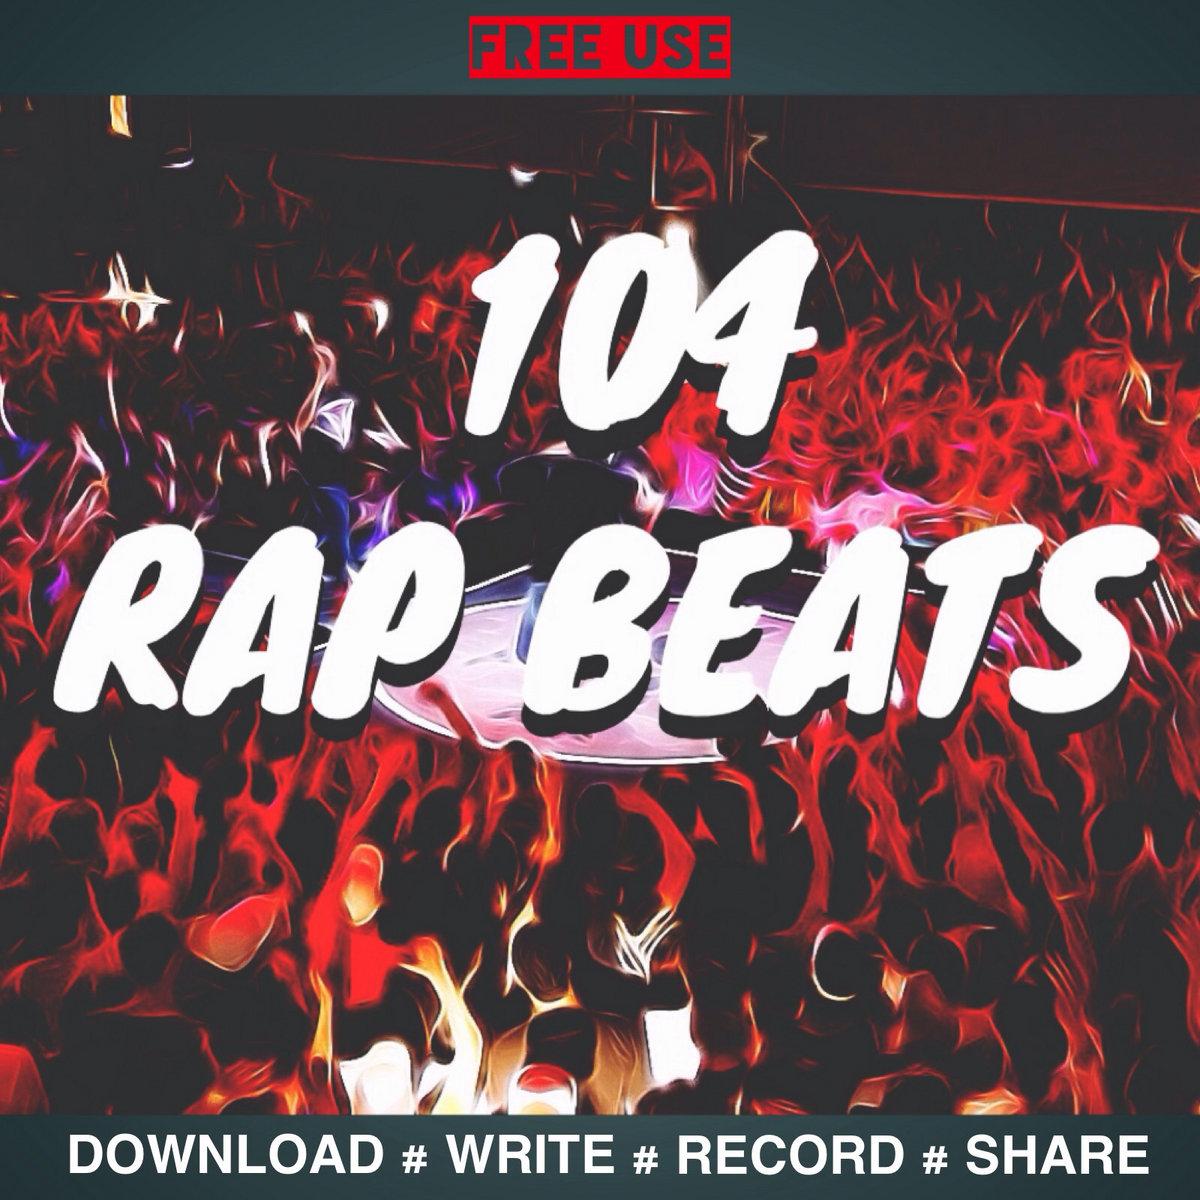 104 Rap Beats (Royalty Free - Free Use) | DJ Tools 4 Turntablism